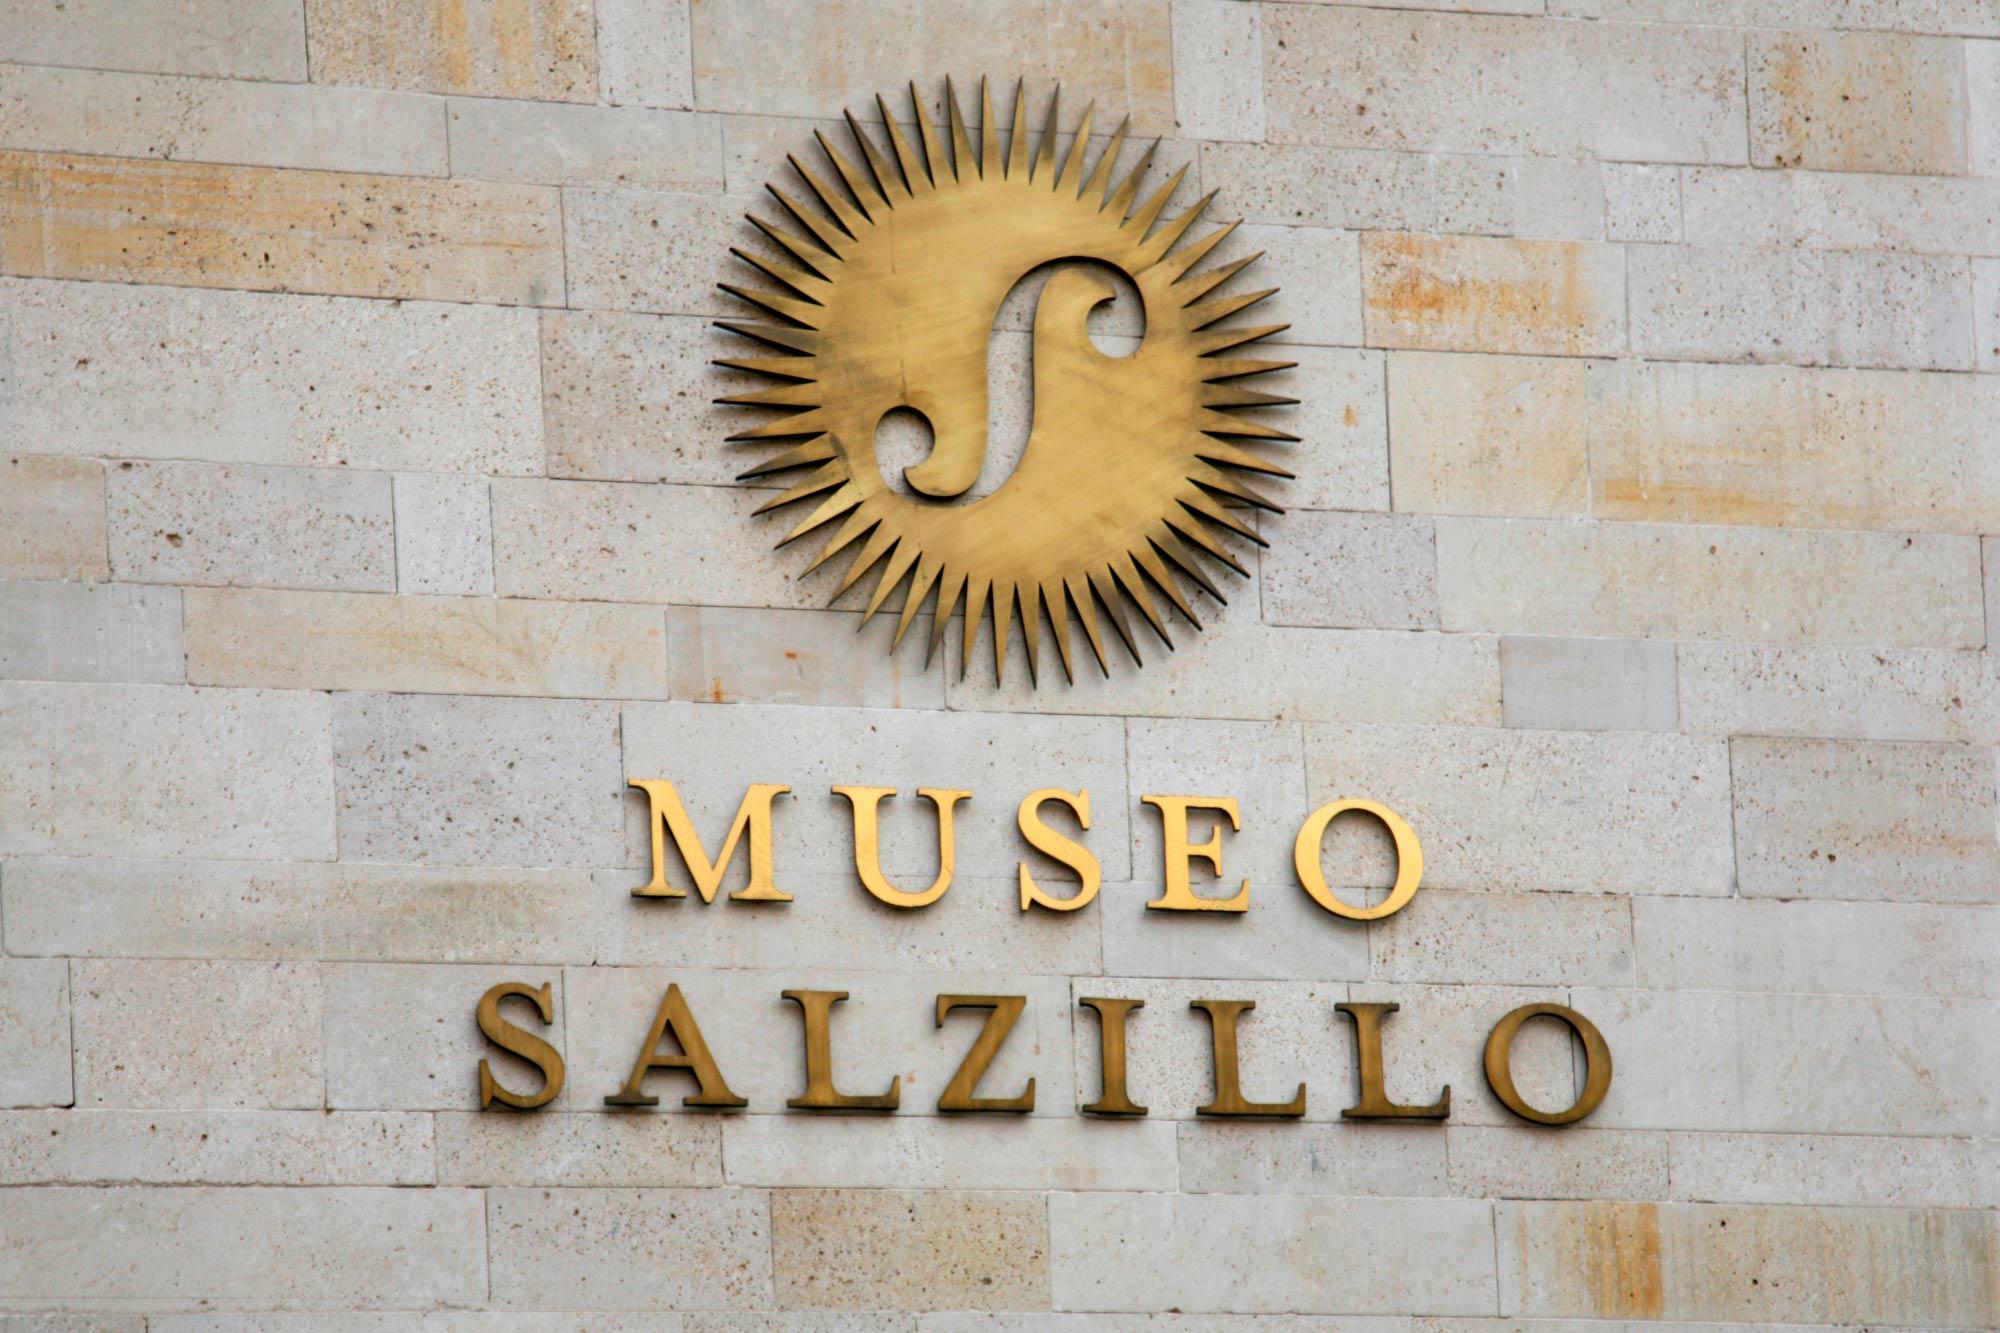 Museo-salzillo-branding-02